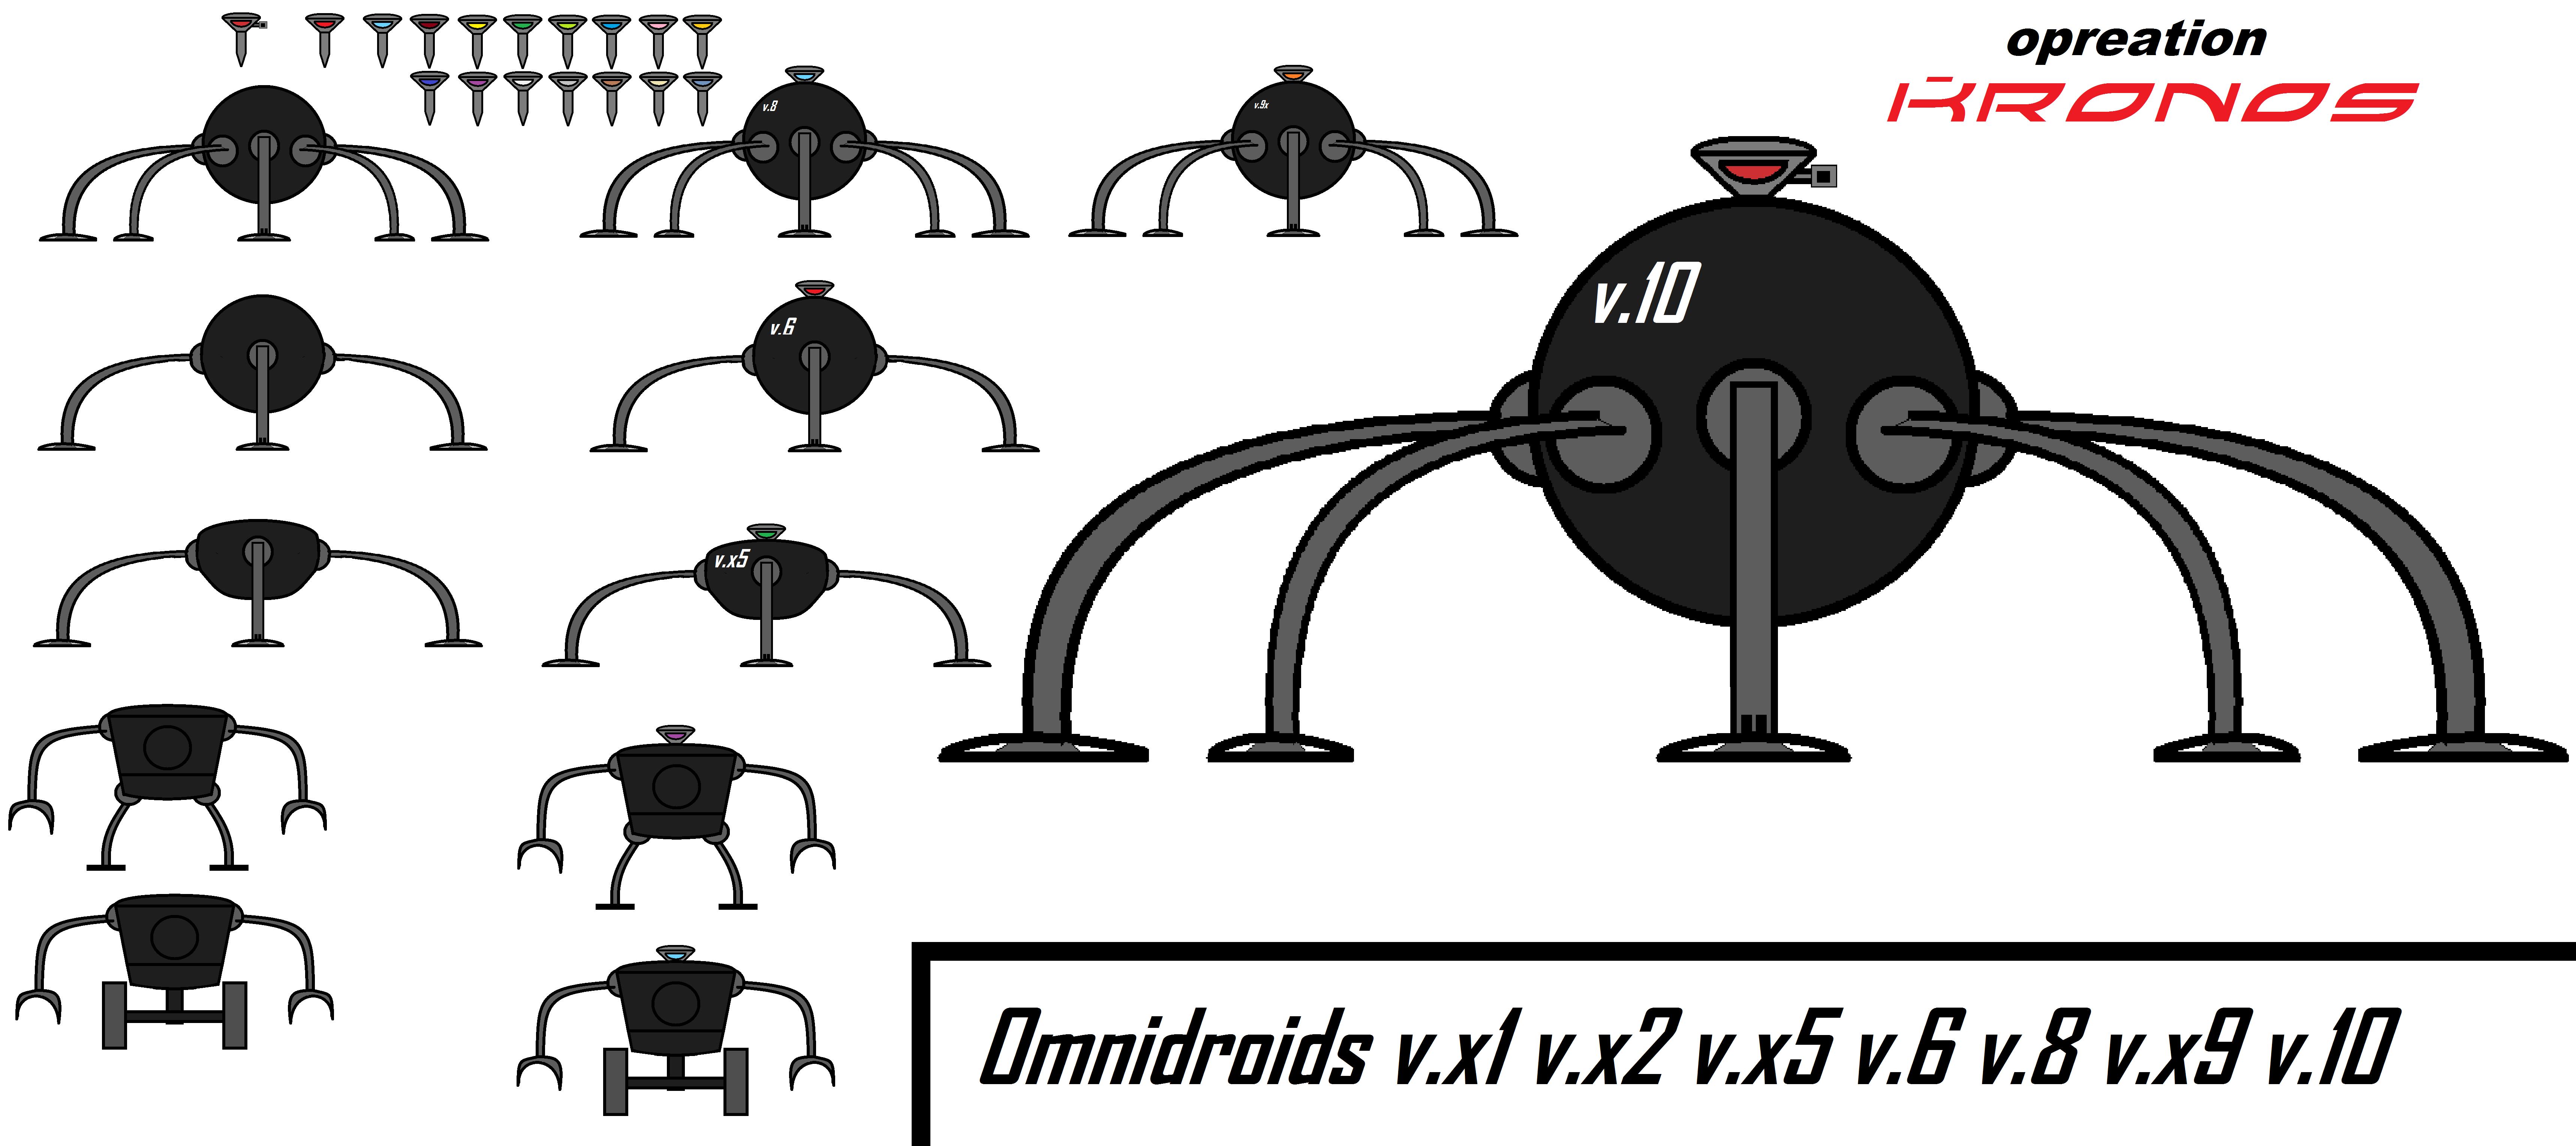 Omnidroid 2